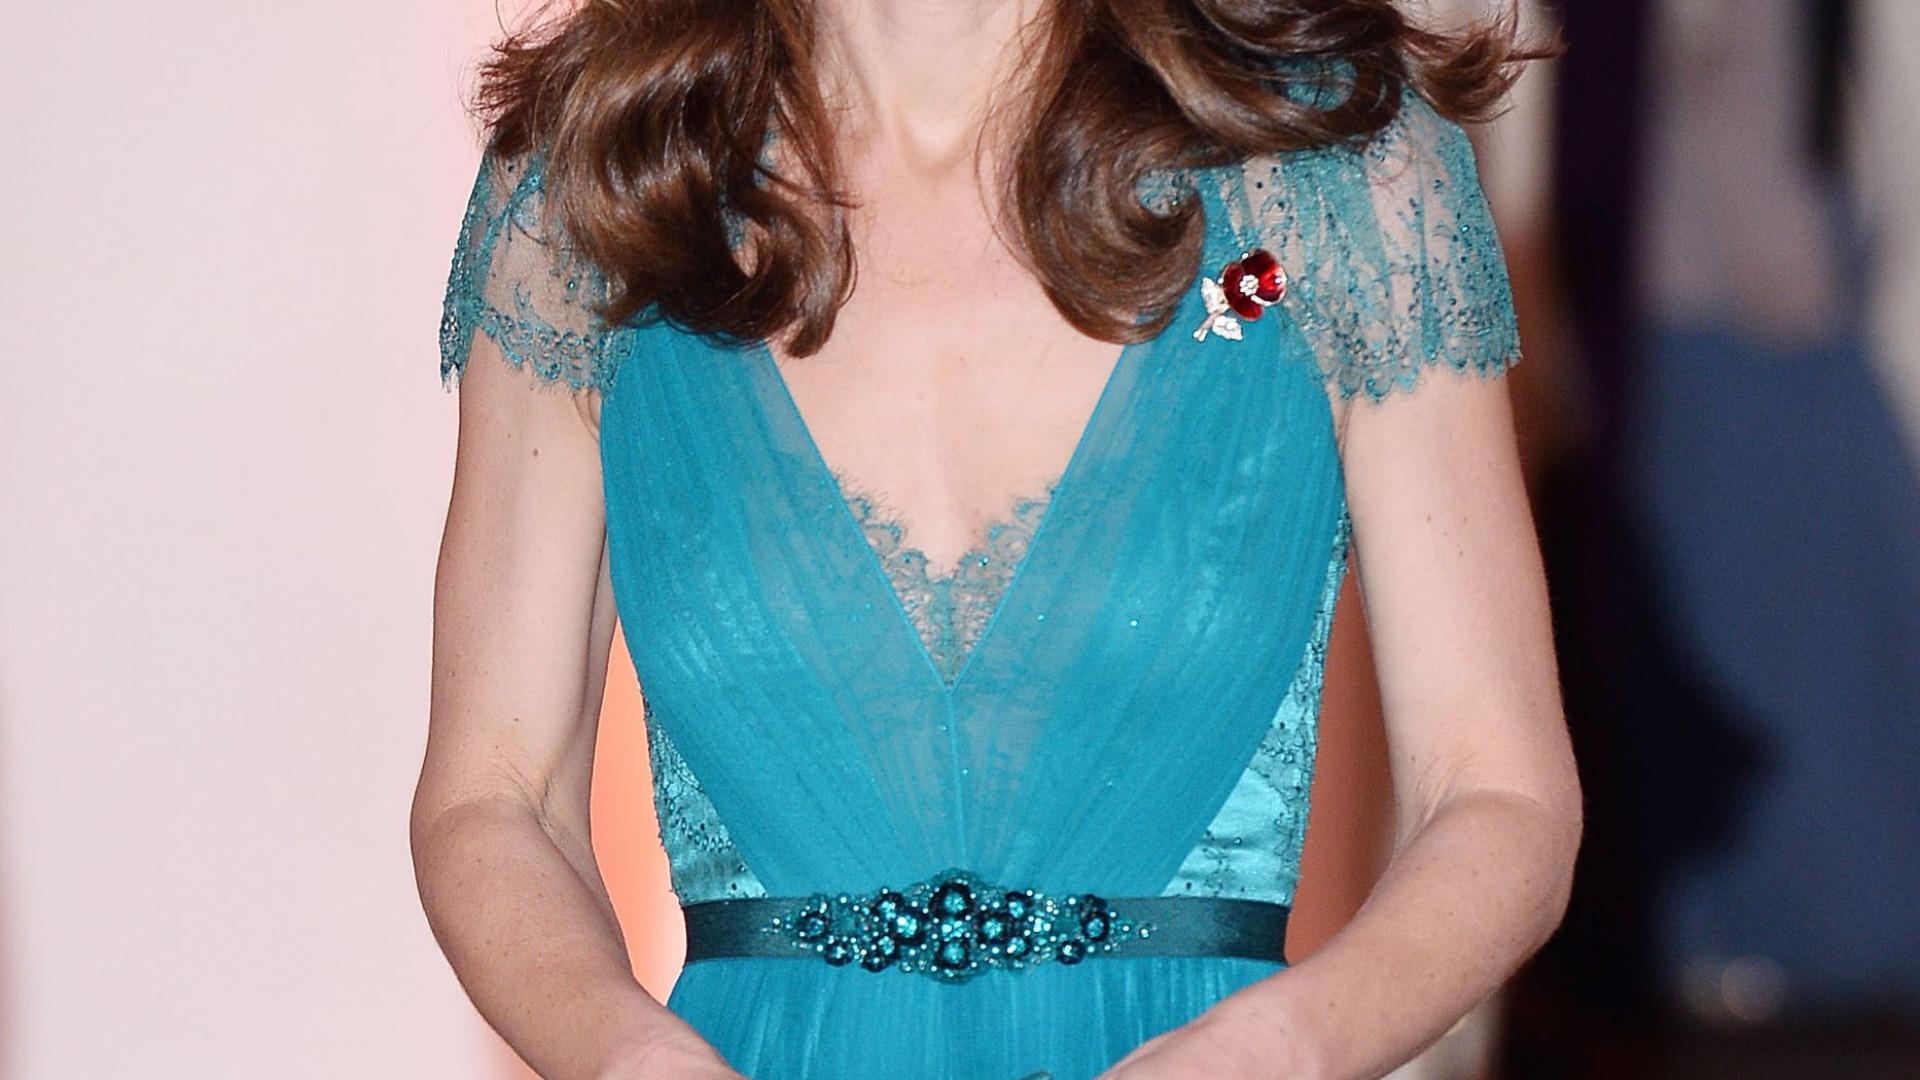 Mayton Eugenio (b. 1987),Suzanne Shepherd Sex picture Valeria D'Obici,Elaine Lee (actress)